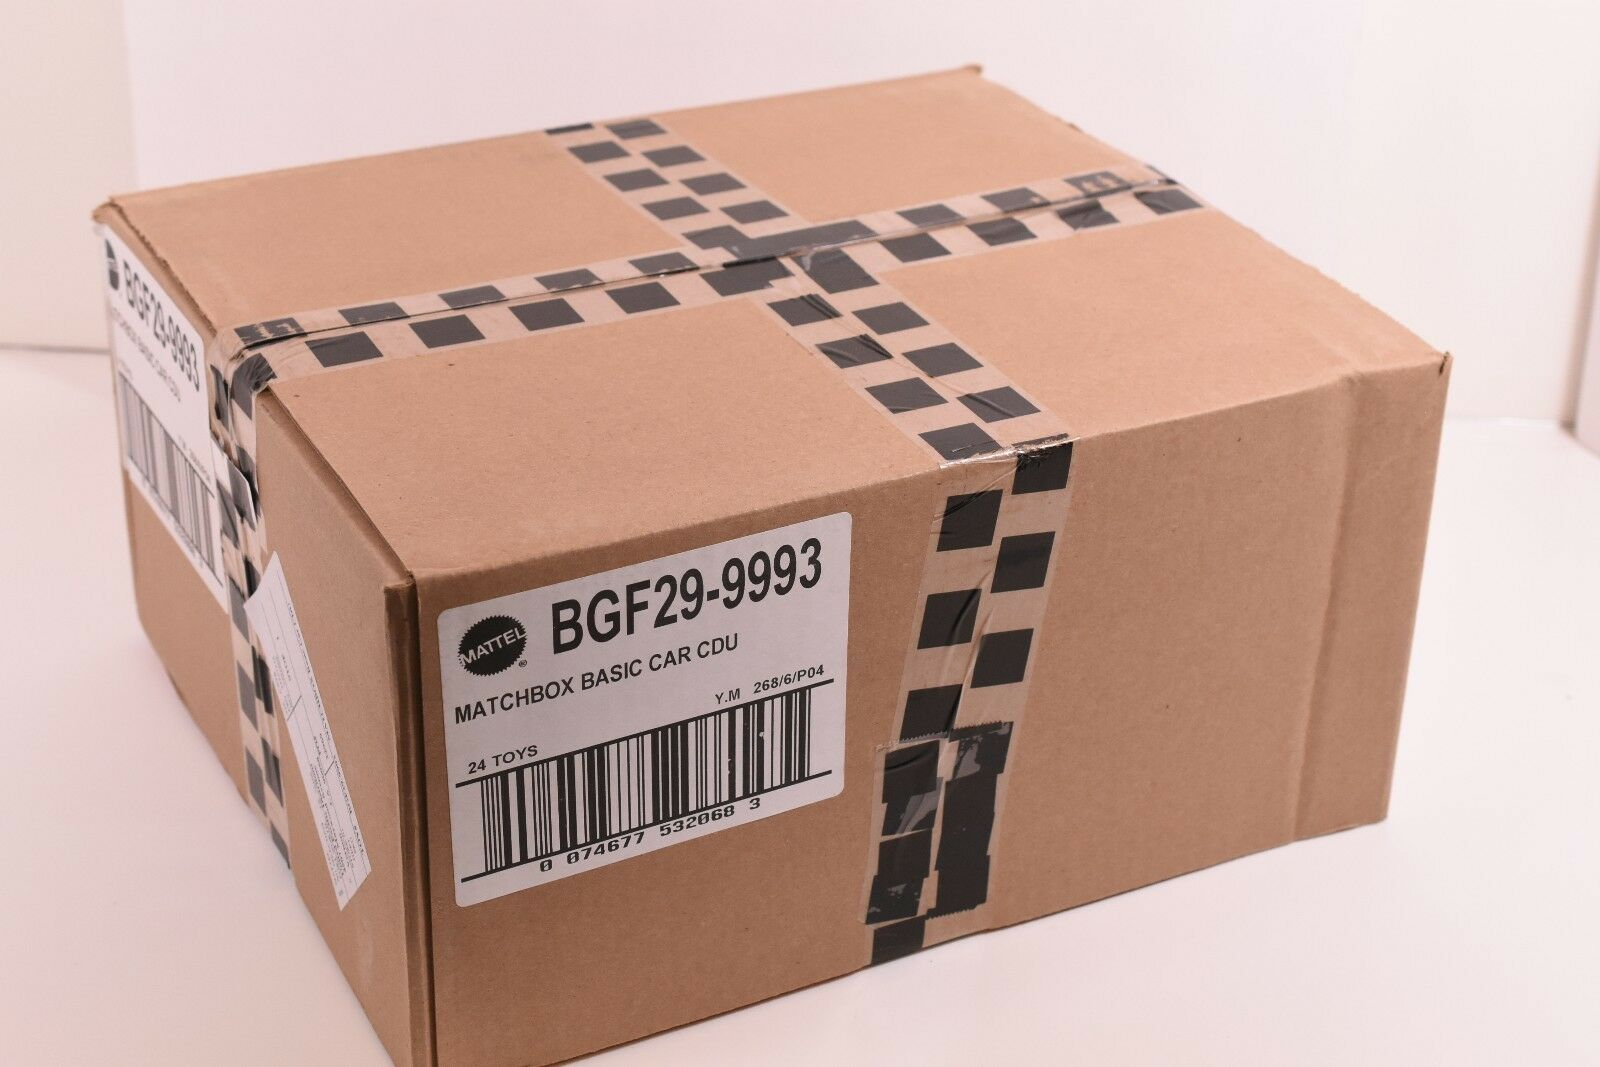 BGF299993 MATTEL MATCHBOX BASIC CAR IN A DISPLAY UNIT MASTER BOX 24 CARS